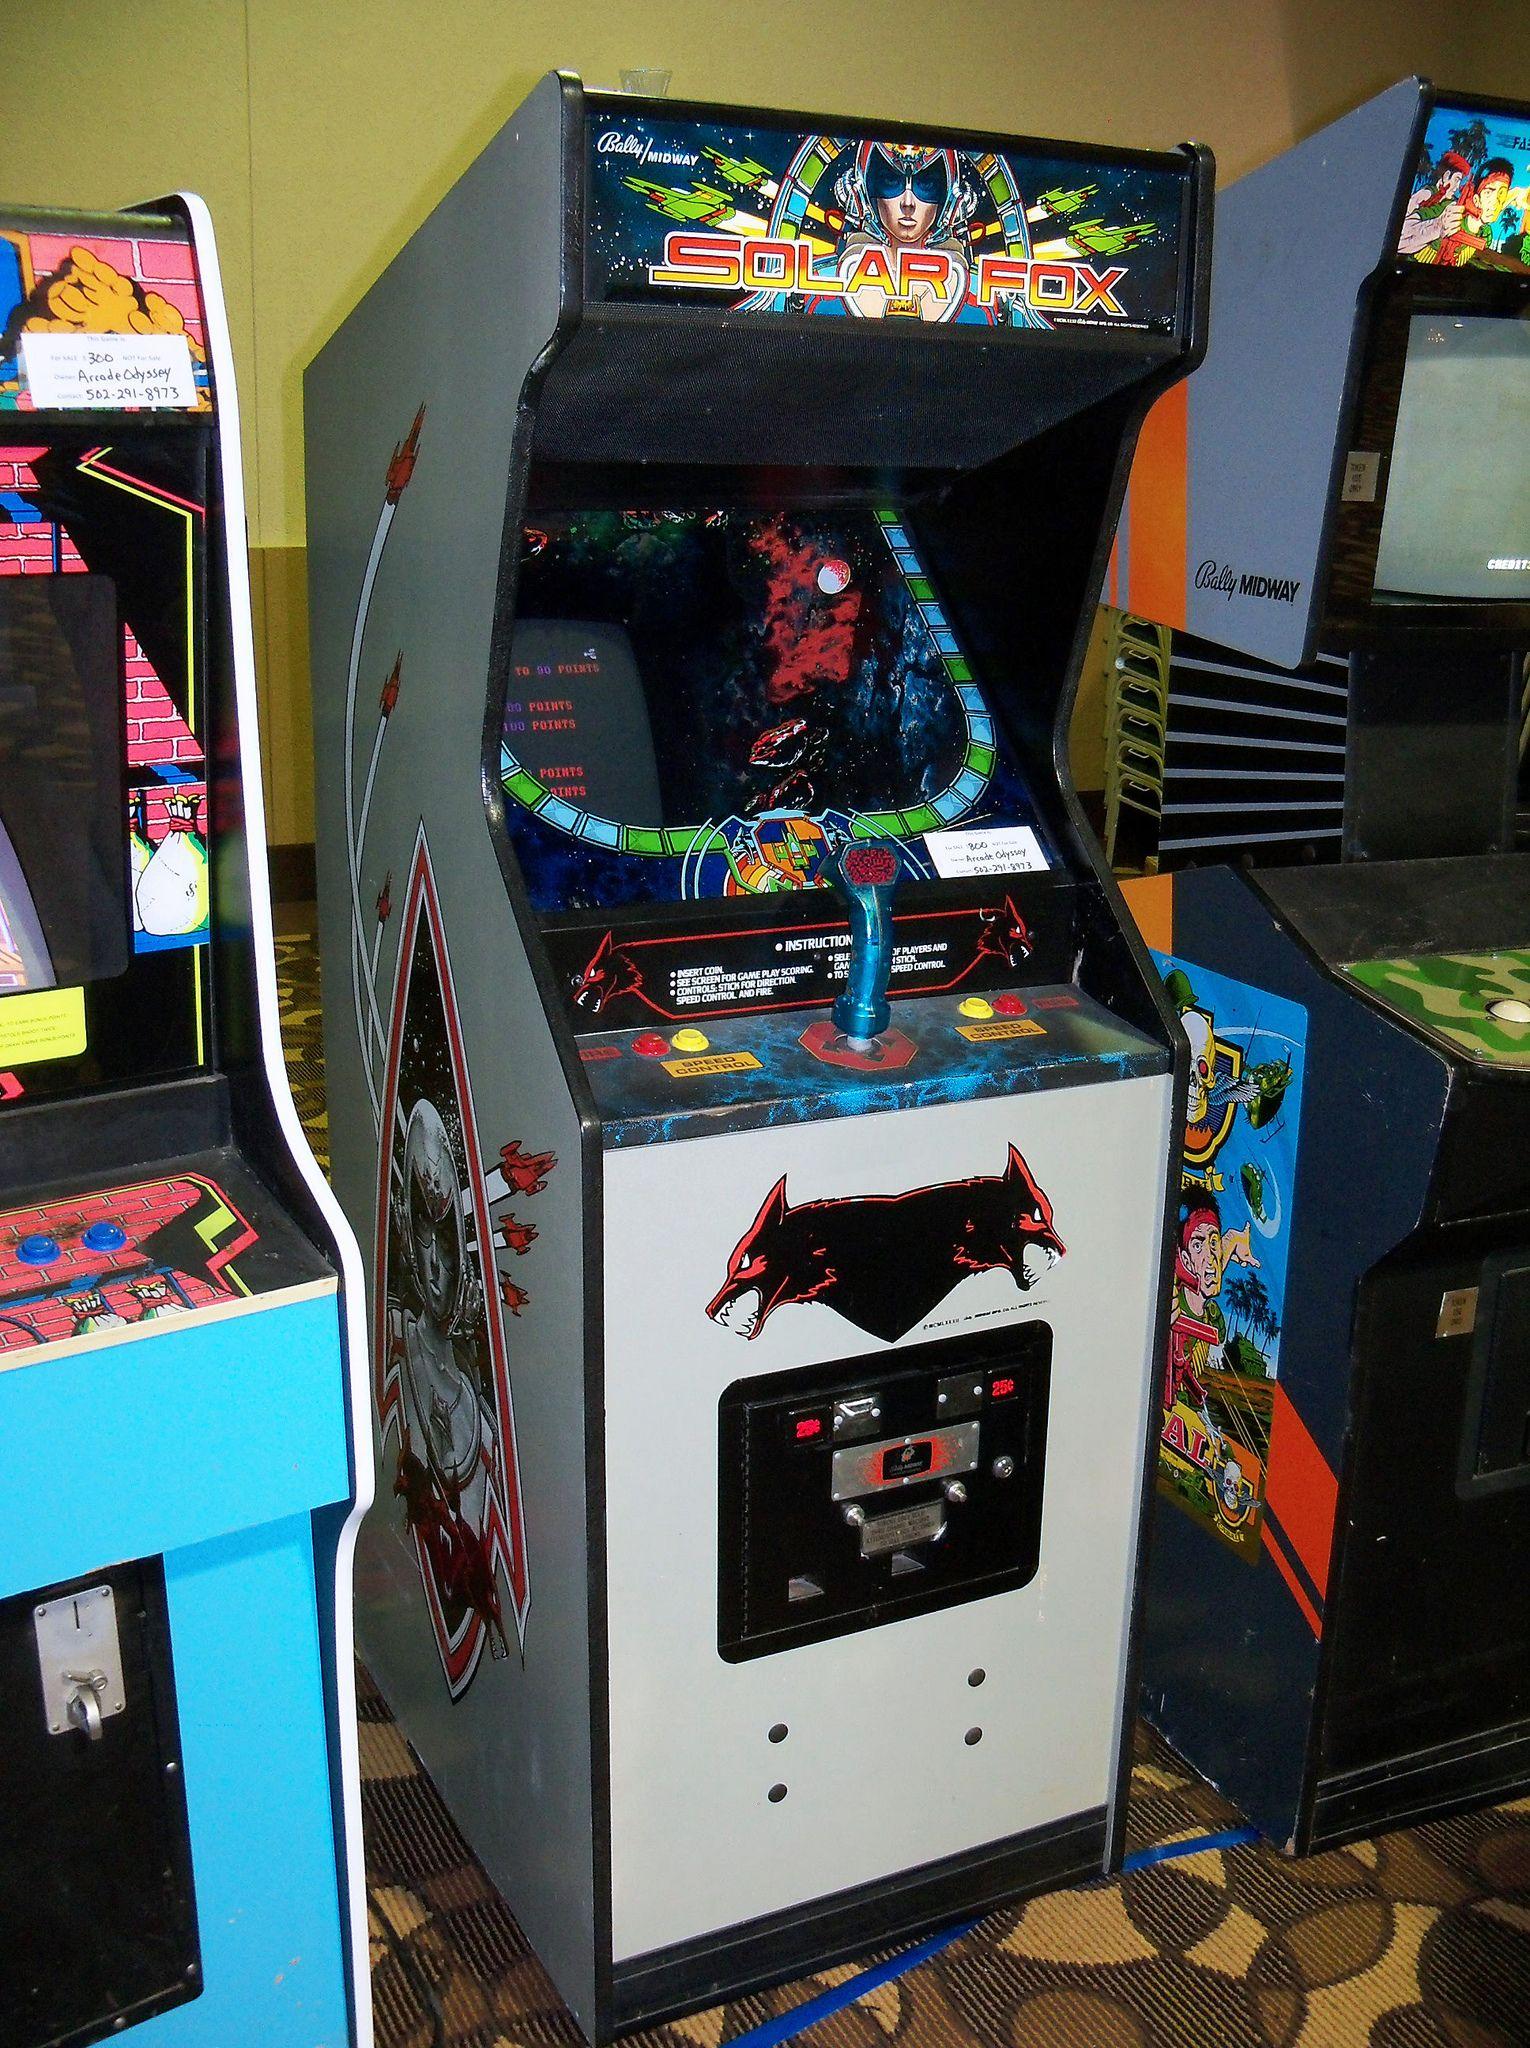 Ky Louisville Solar Fox Arcade Game Room Arcade Arcade Games